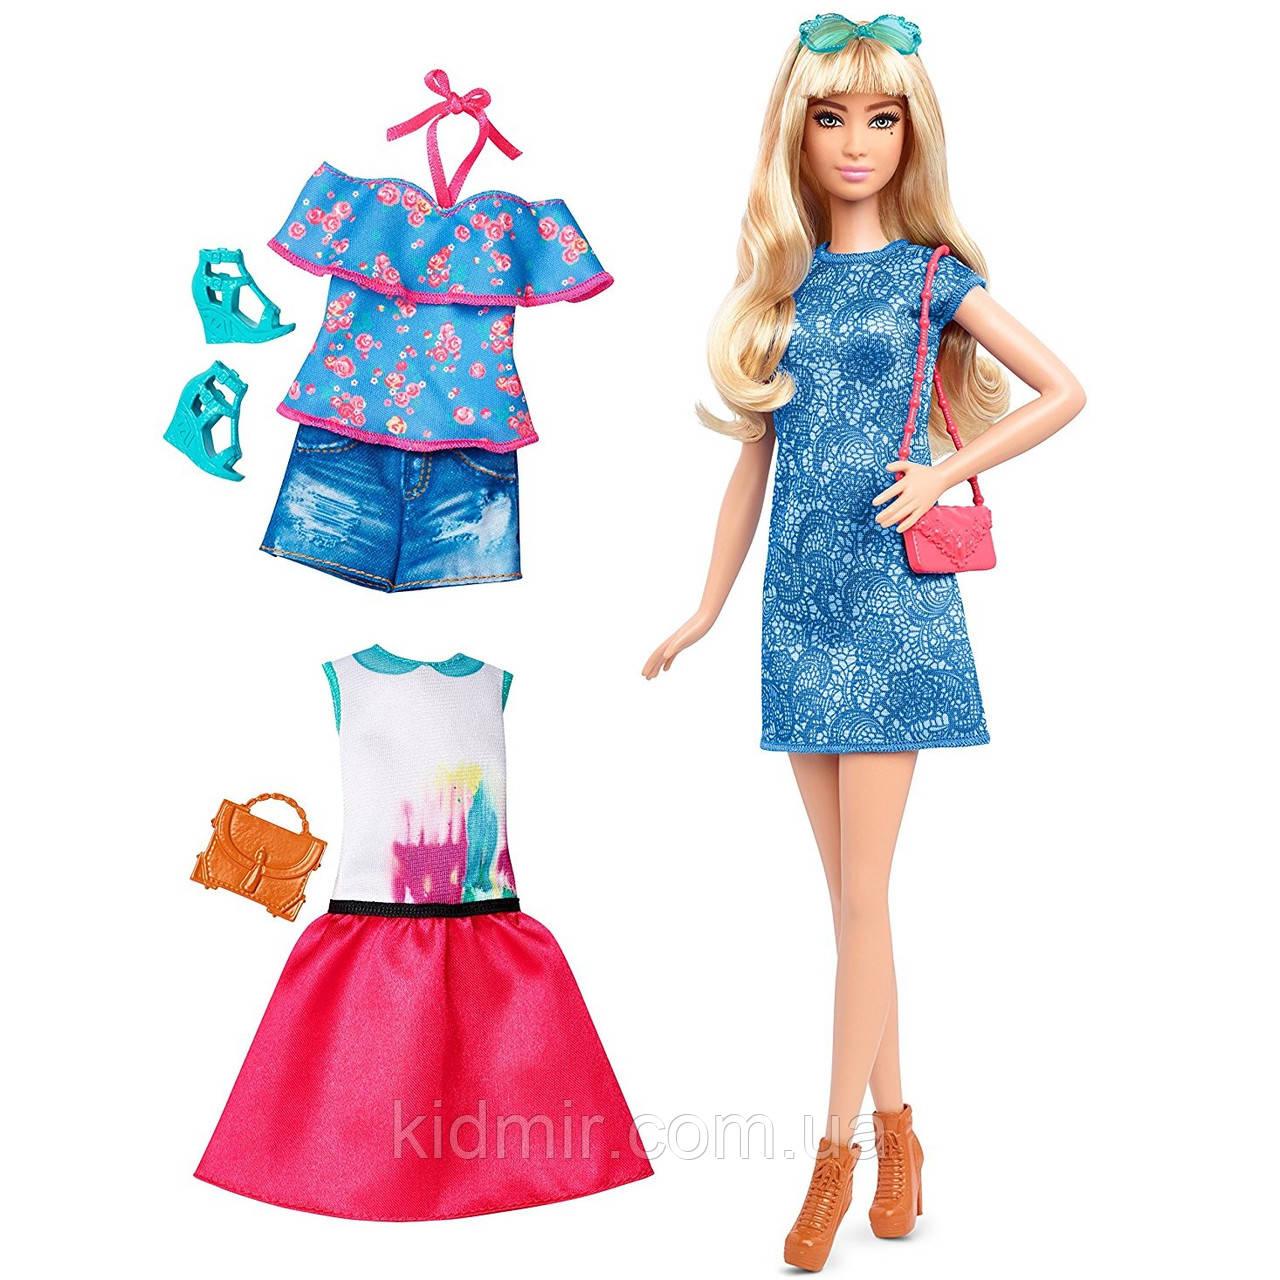 Кукла Барби Модница с набором одежды Лэйси Блу Barbie Fashions Lacey Blue